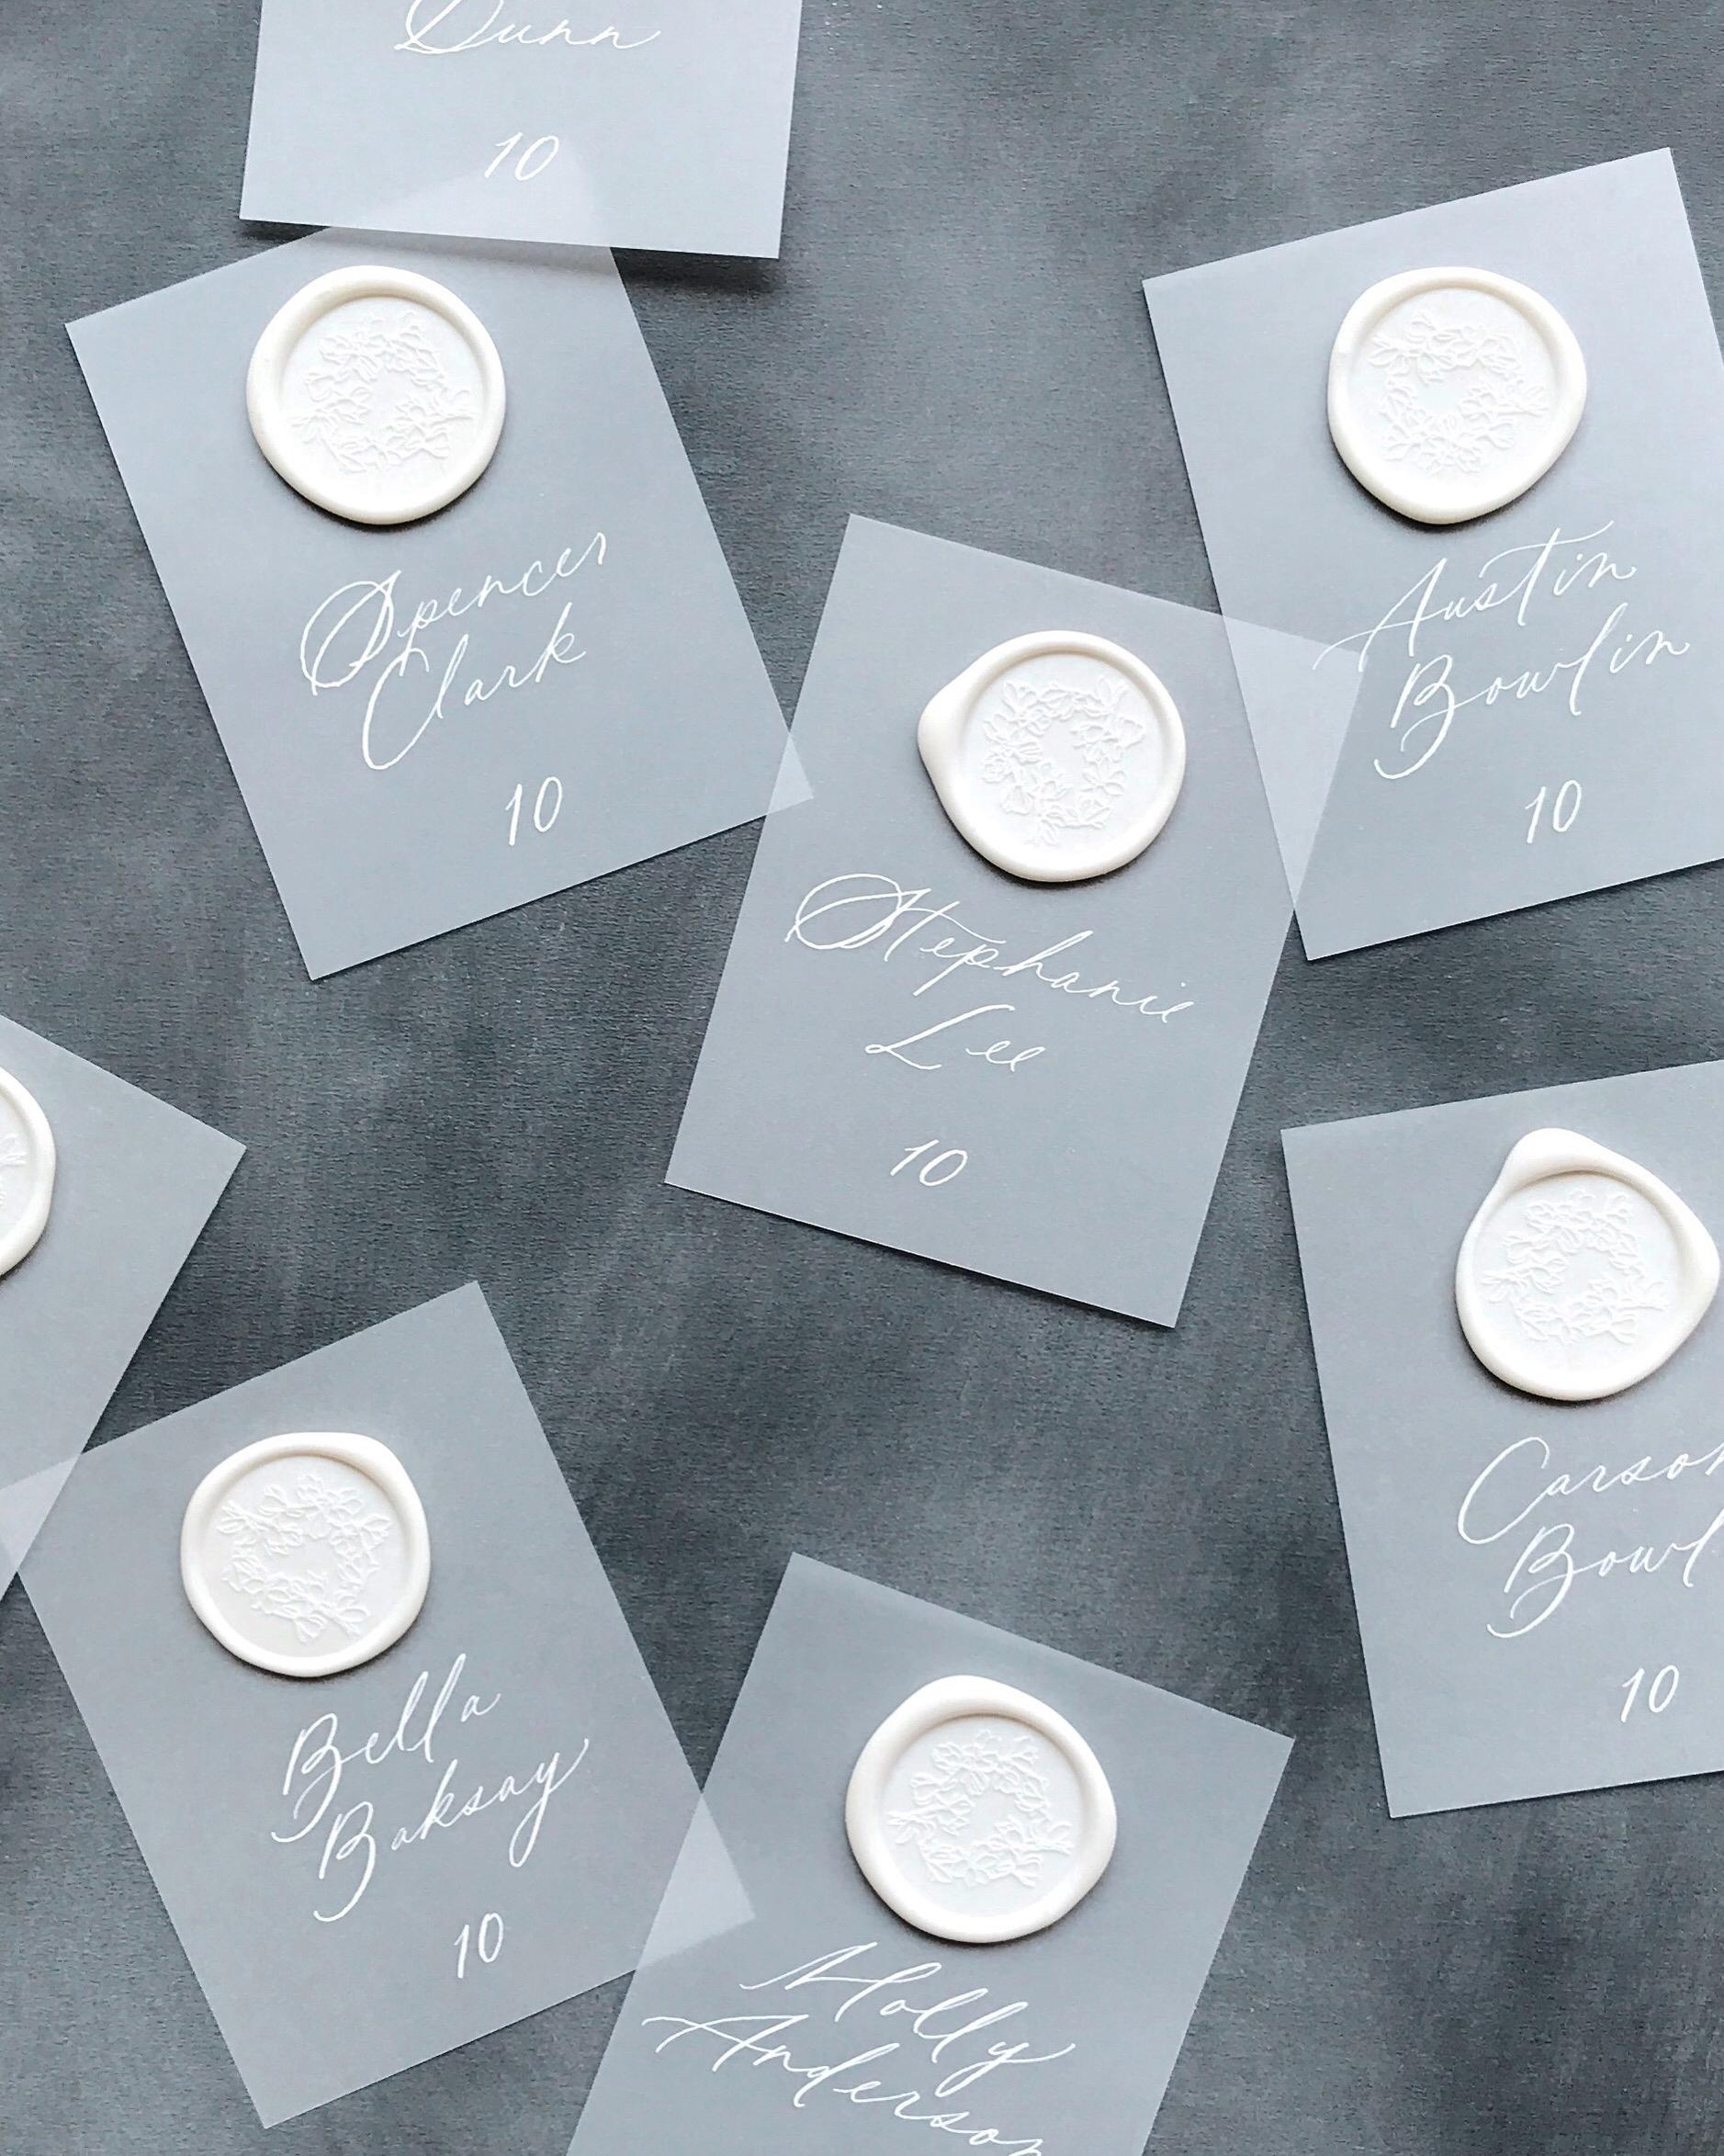 vellum escort cards with wax seals